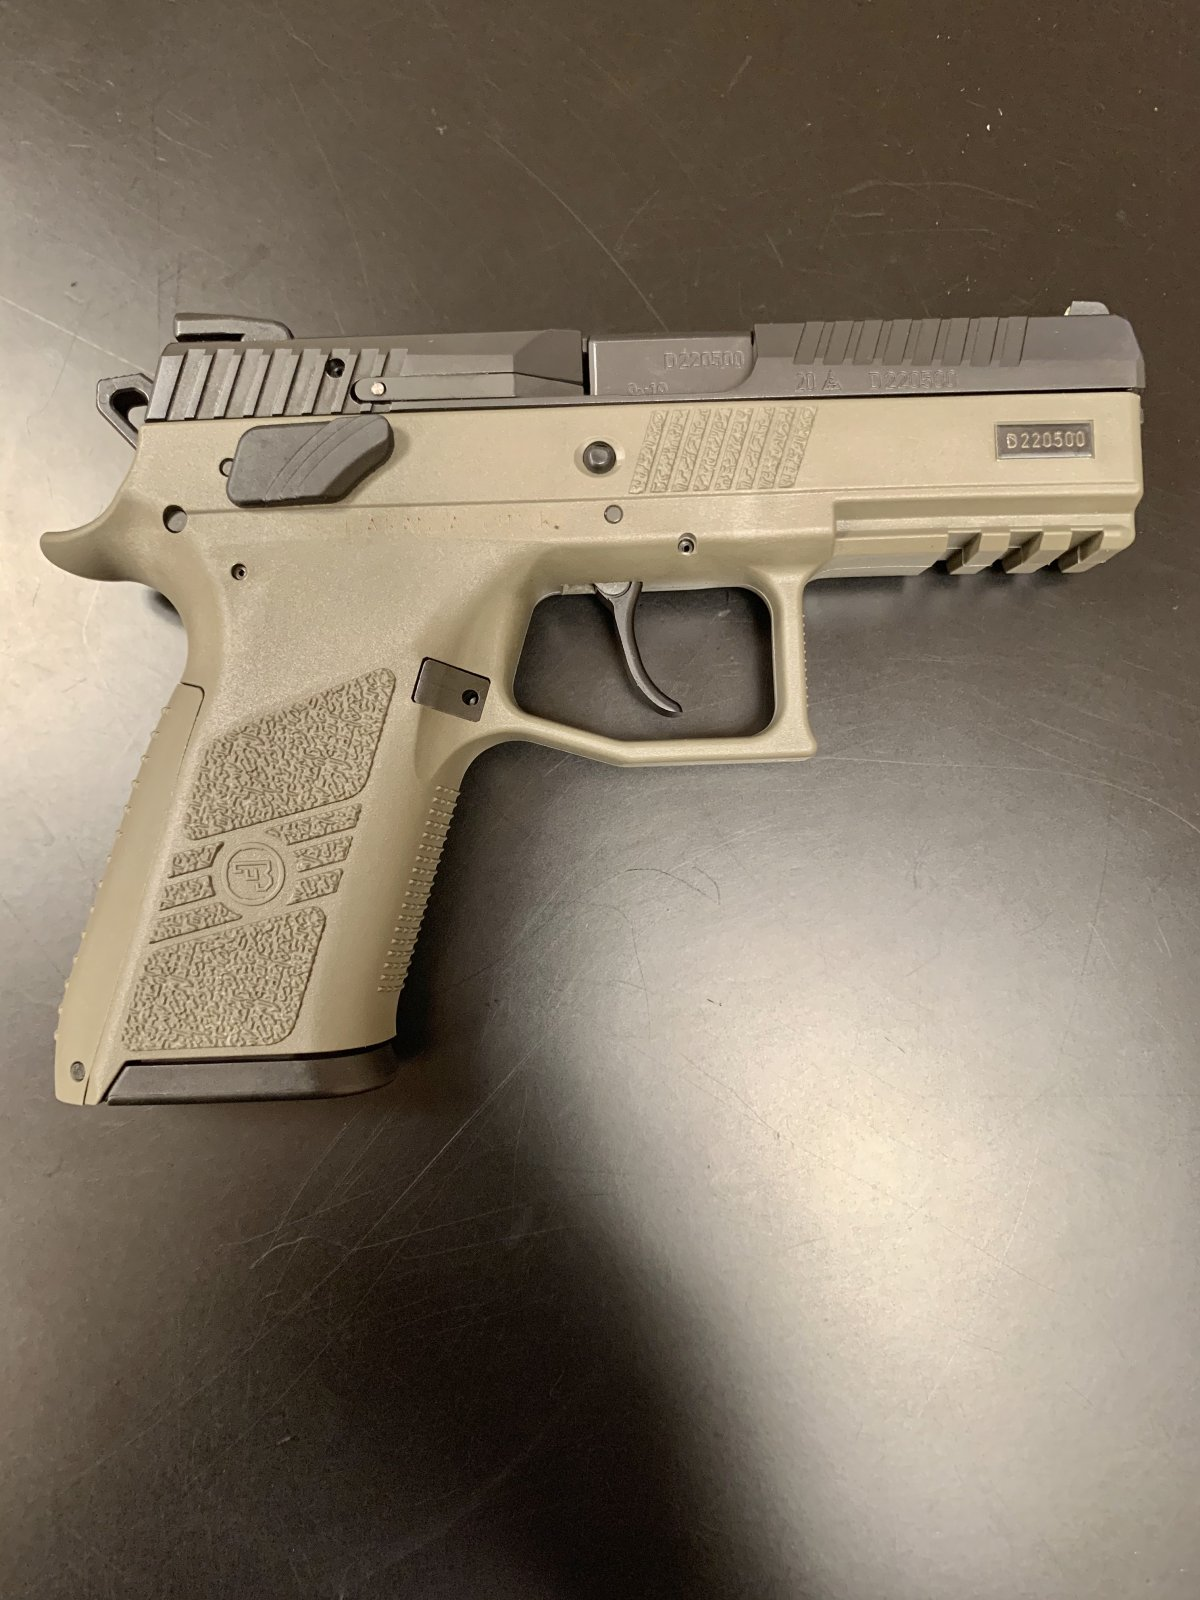 CZ P-07 9mm Compact Semi Automatic Pistol - ODG